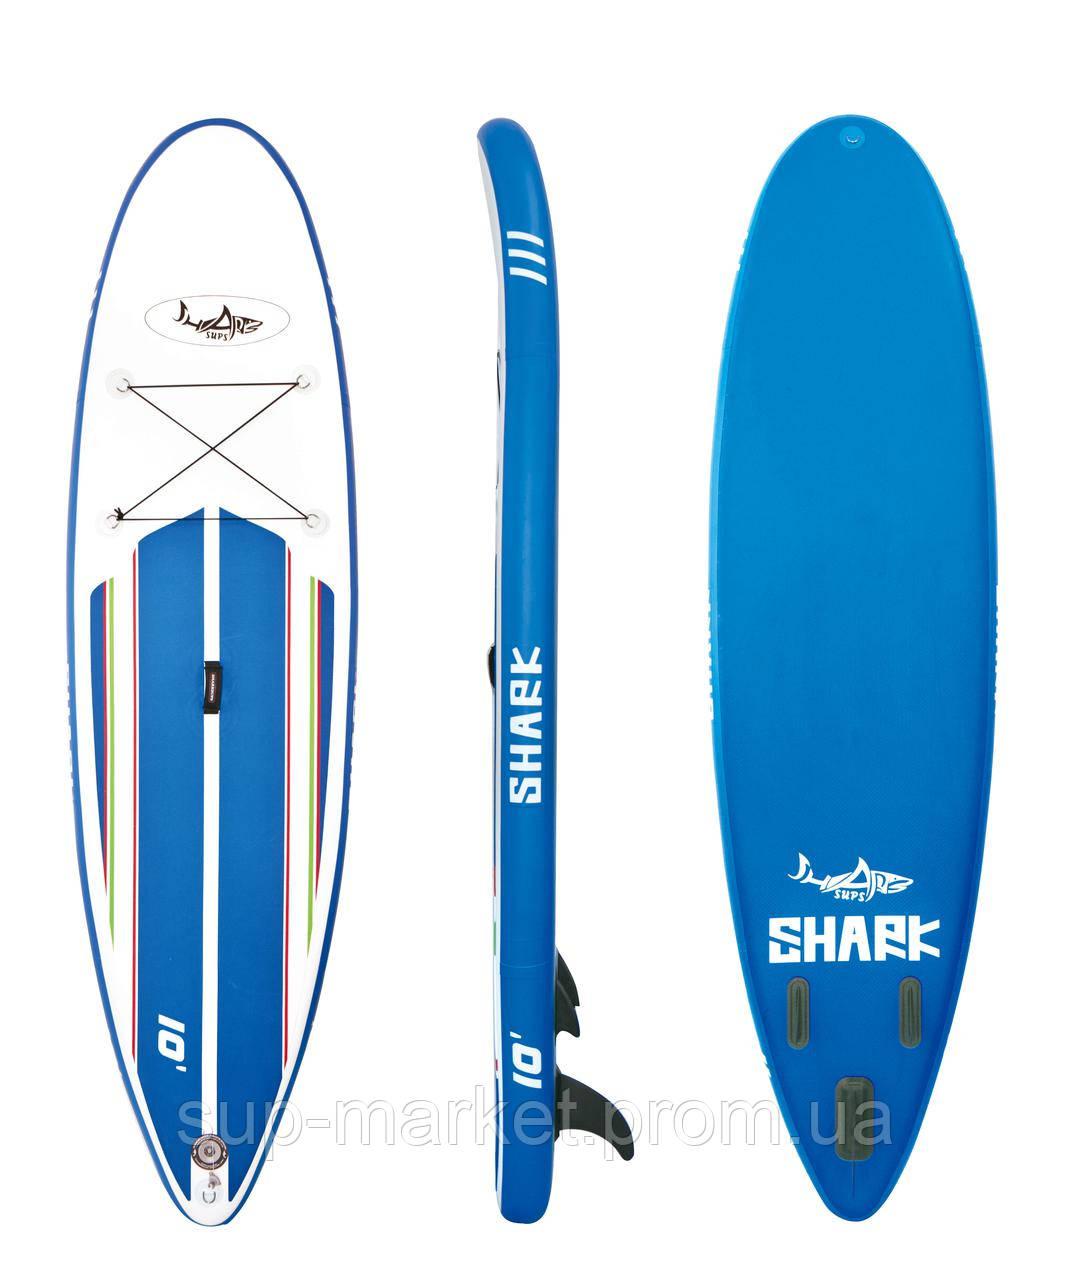 "SUP доска Shark All-Round Regular 10'0"", SAR-305, 2018"